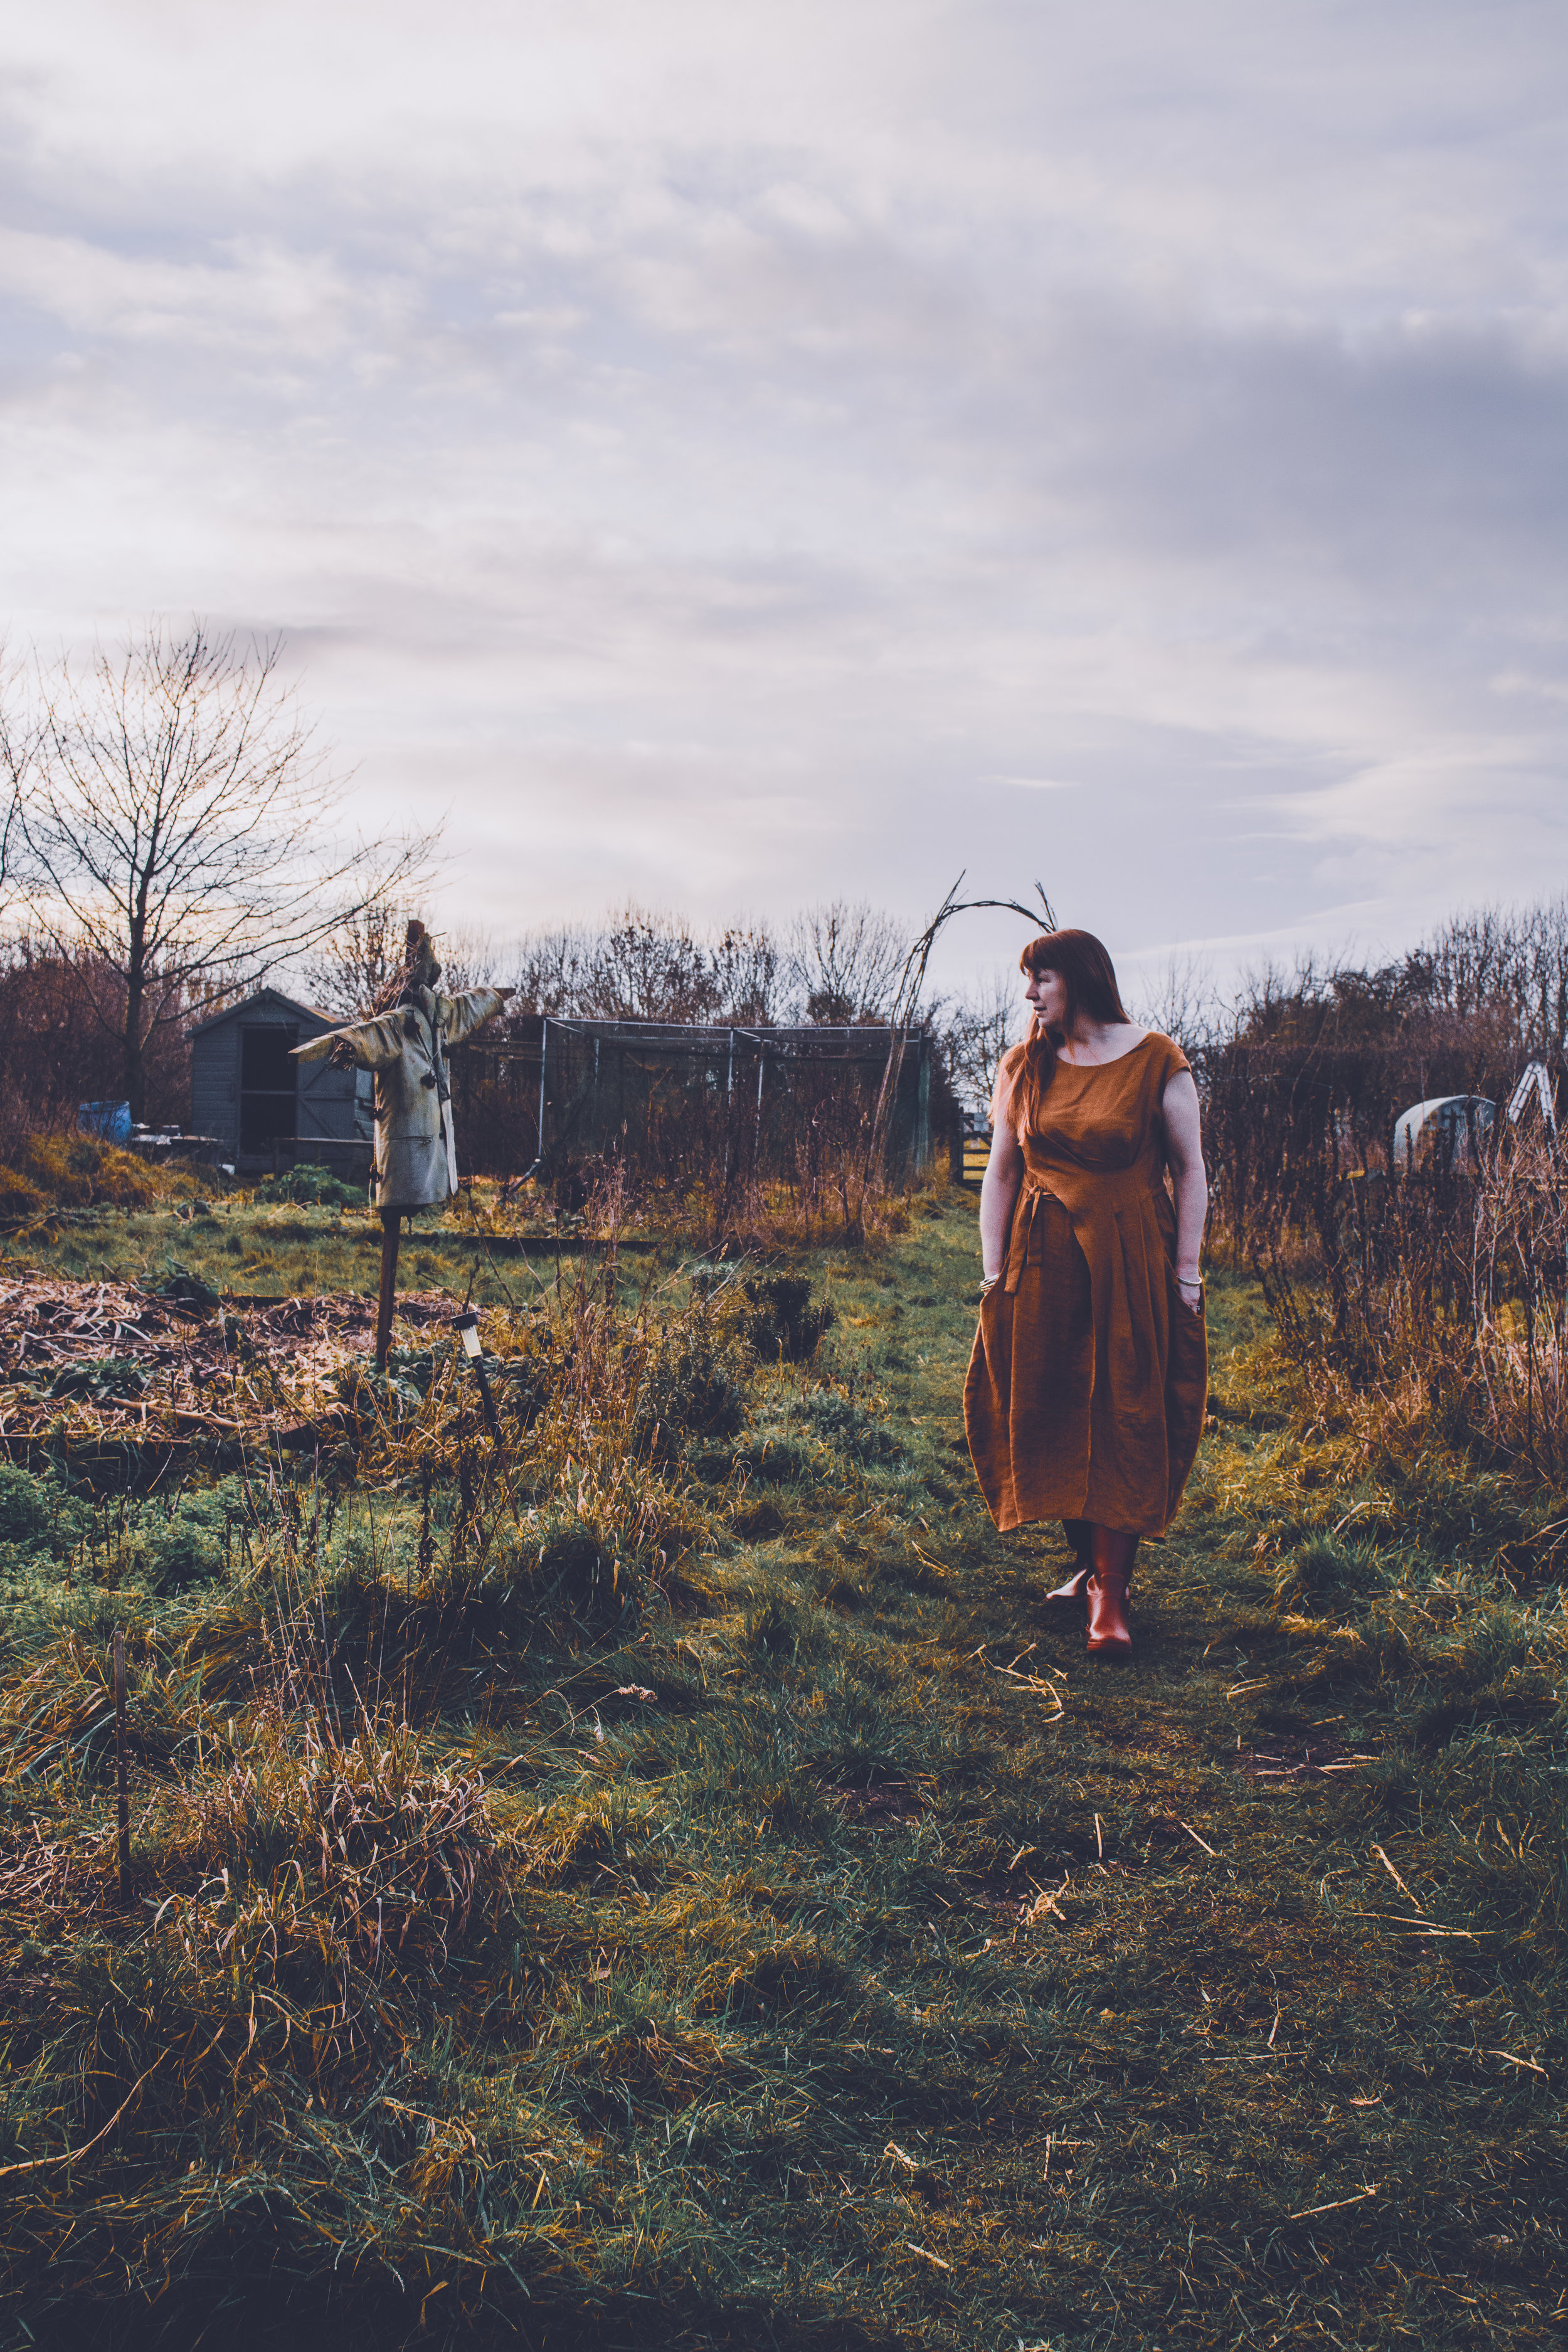 Mum in the veg plot in her  New Fold Dress  in Rust.